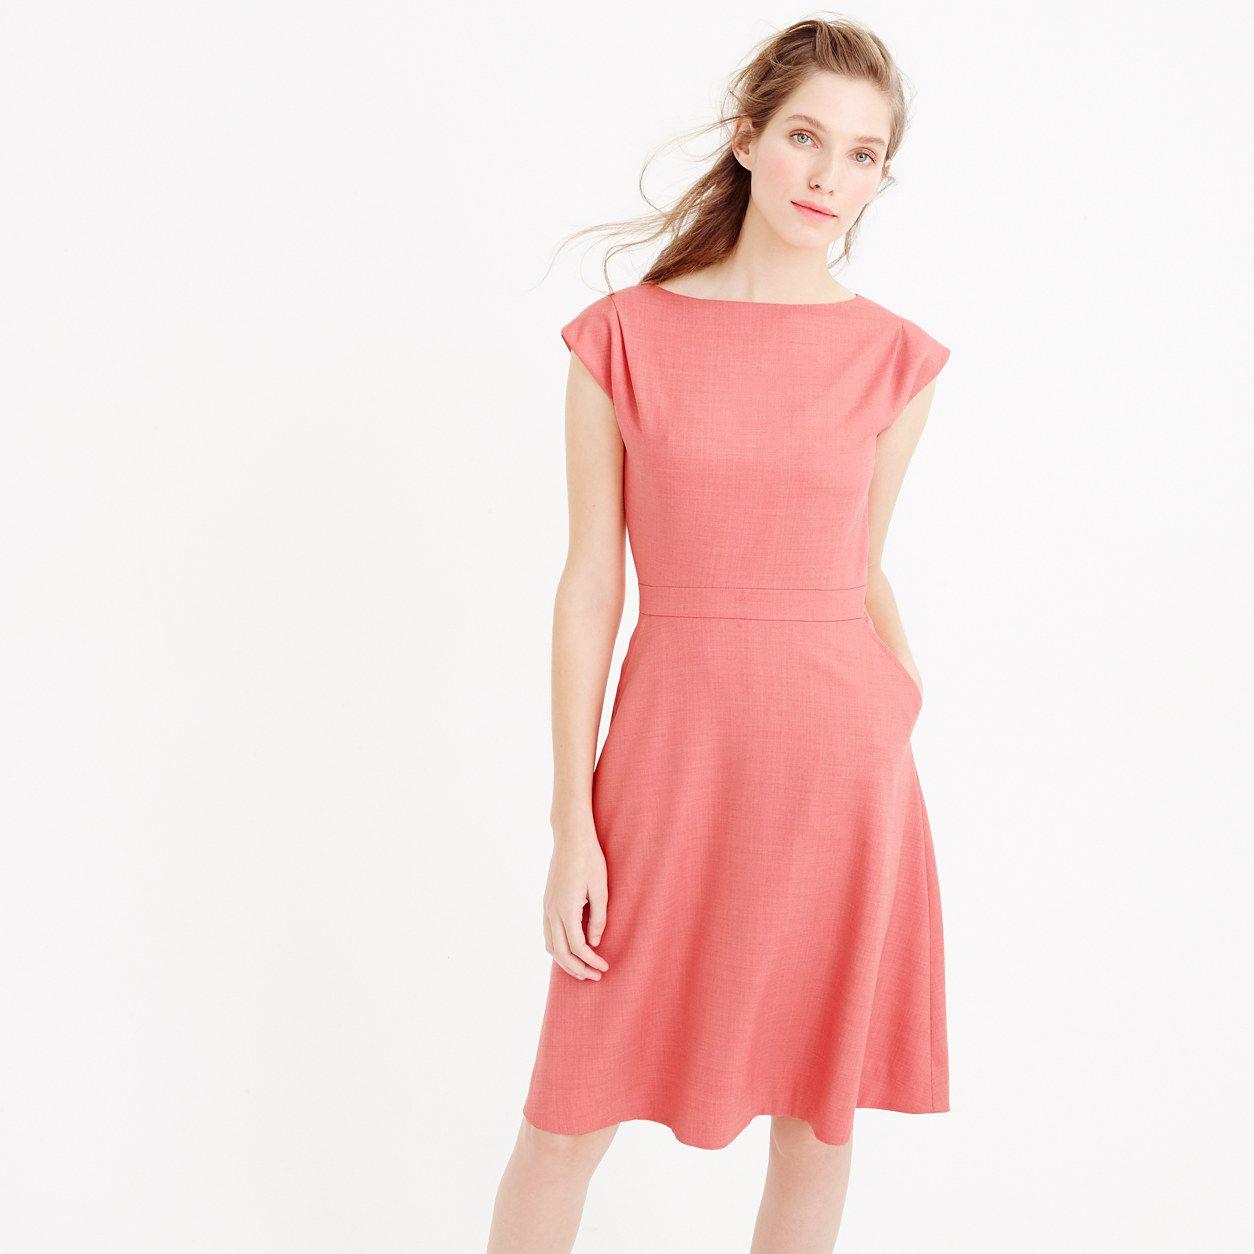 5f961ed995 J.Crew Womens Cap-Sleeve Dress In Super 120S Wool (Size 10 ...